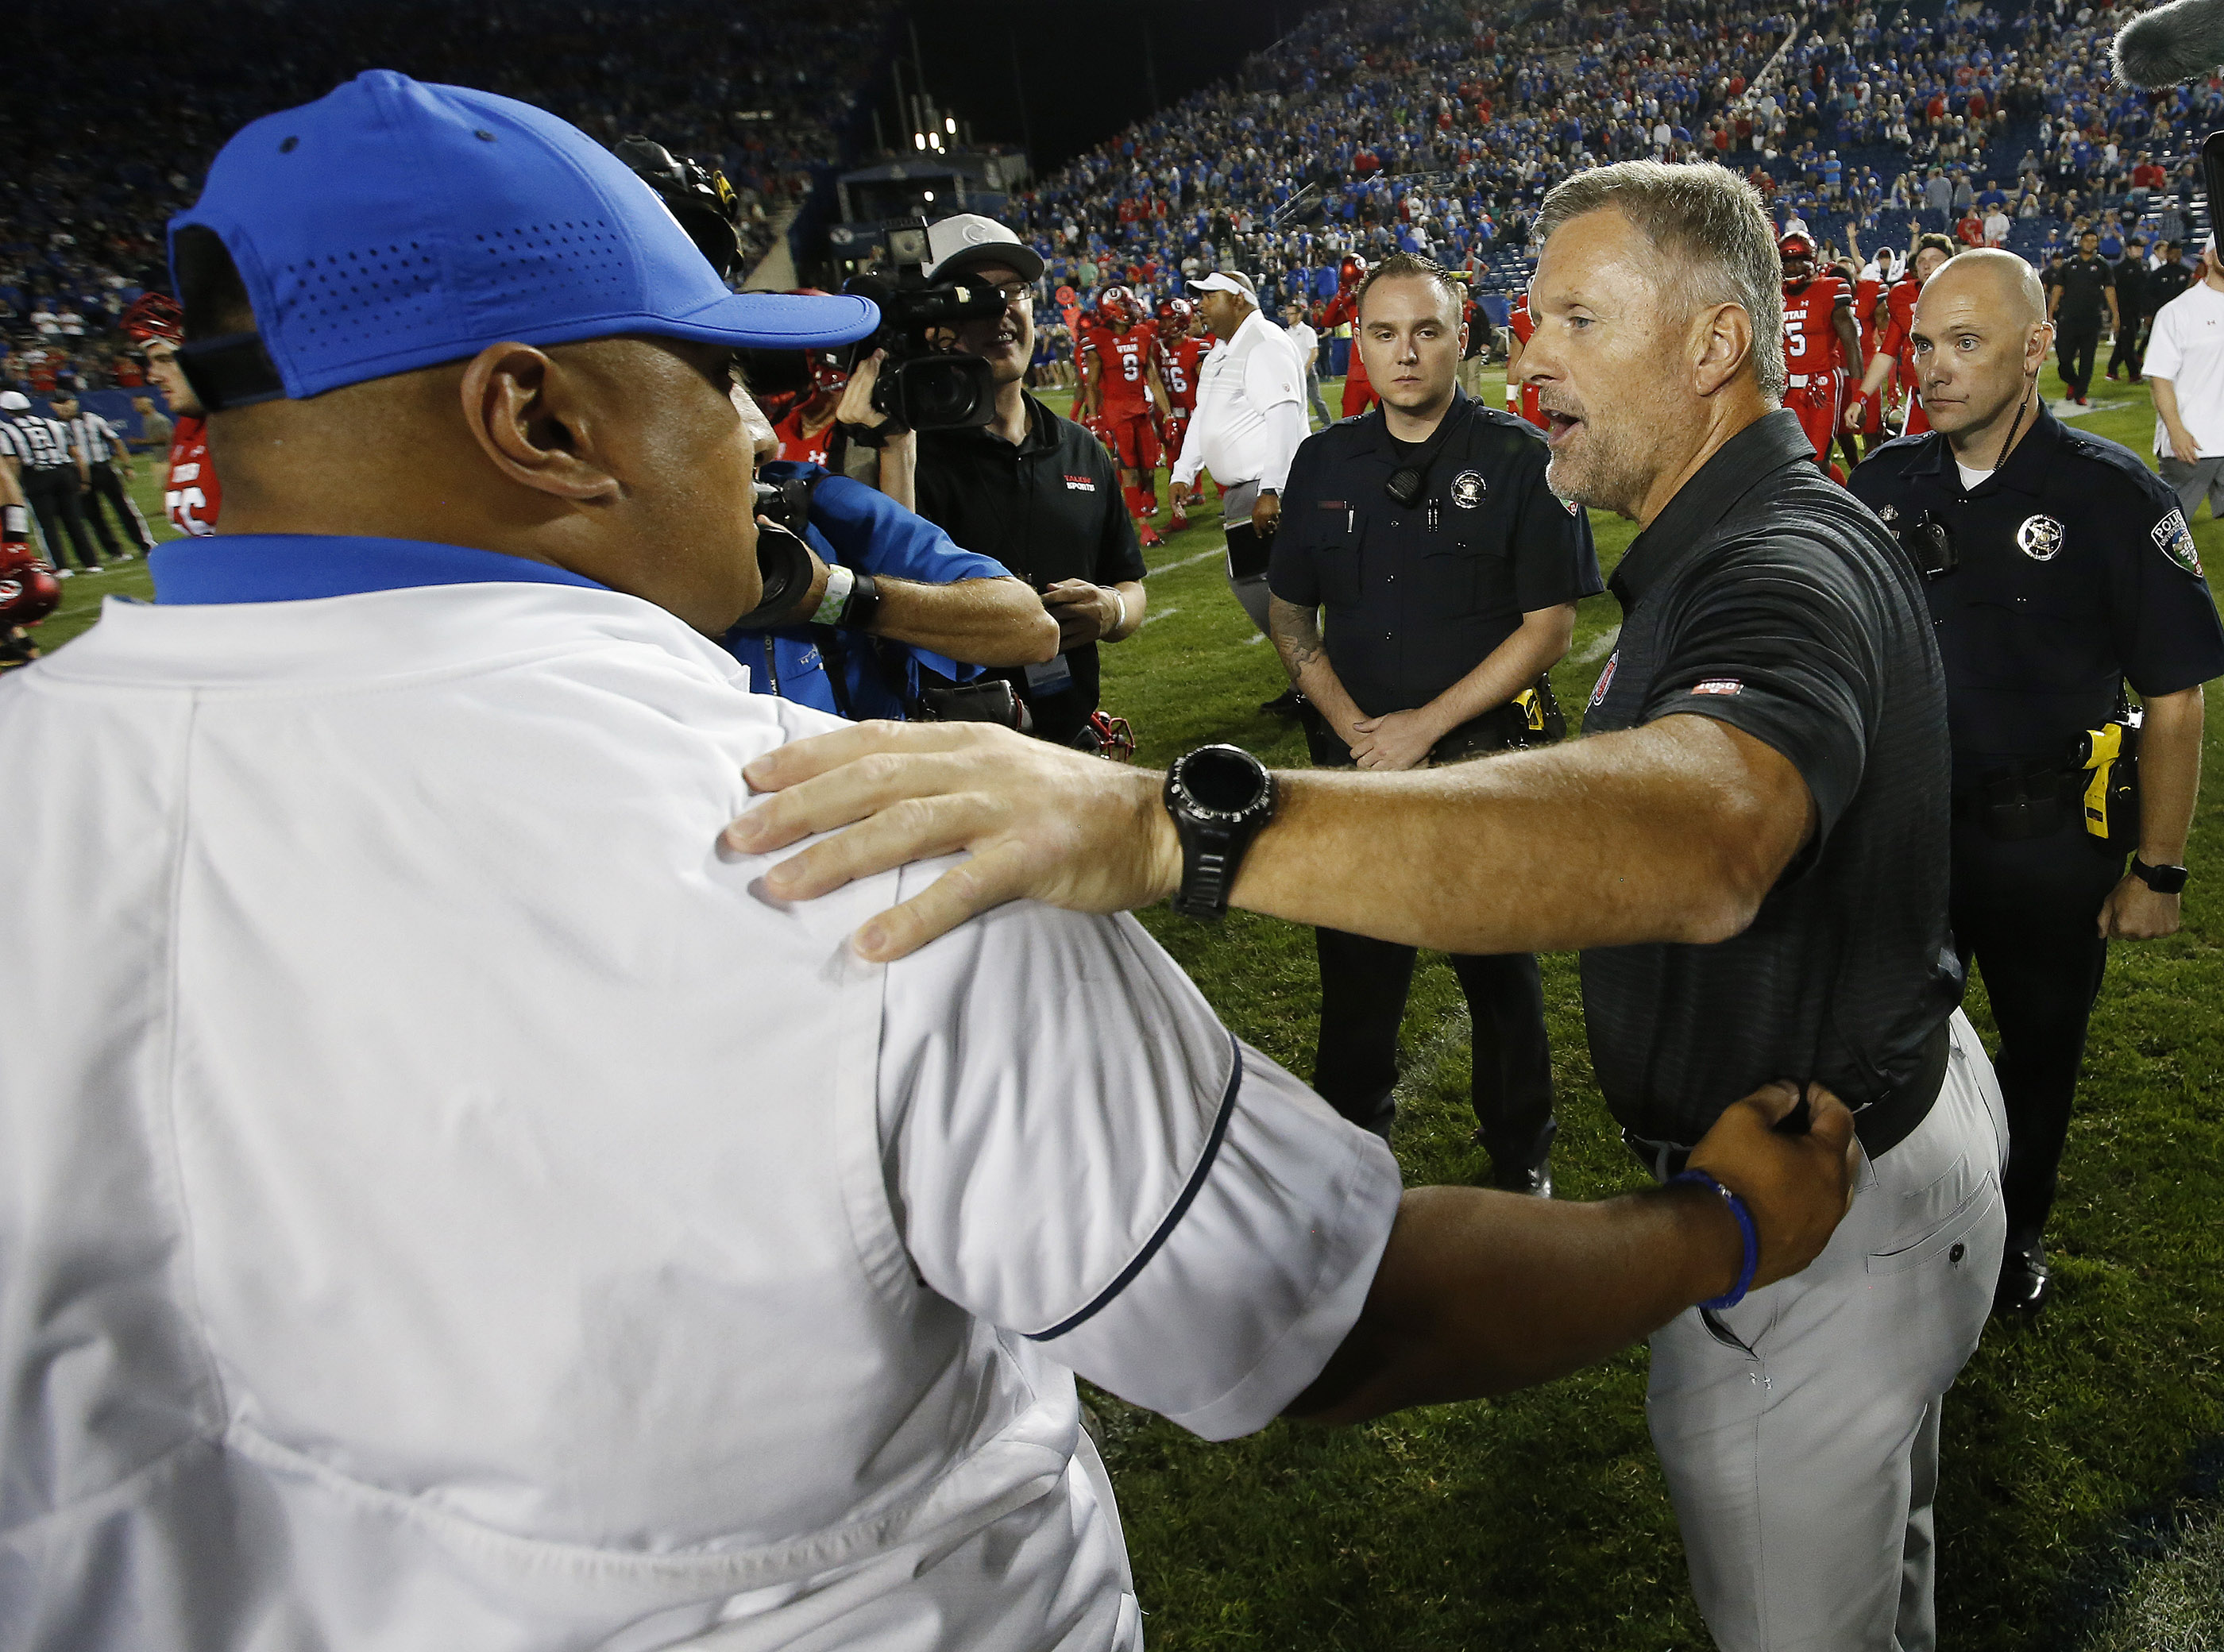 Utah Utes head coach Kyle Whittingham and Brigham Young Cougars head coach Kalani Sitake greet each other